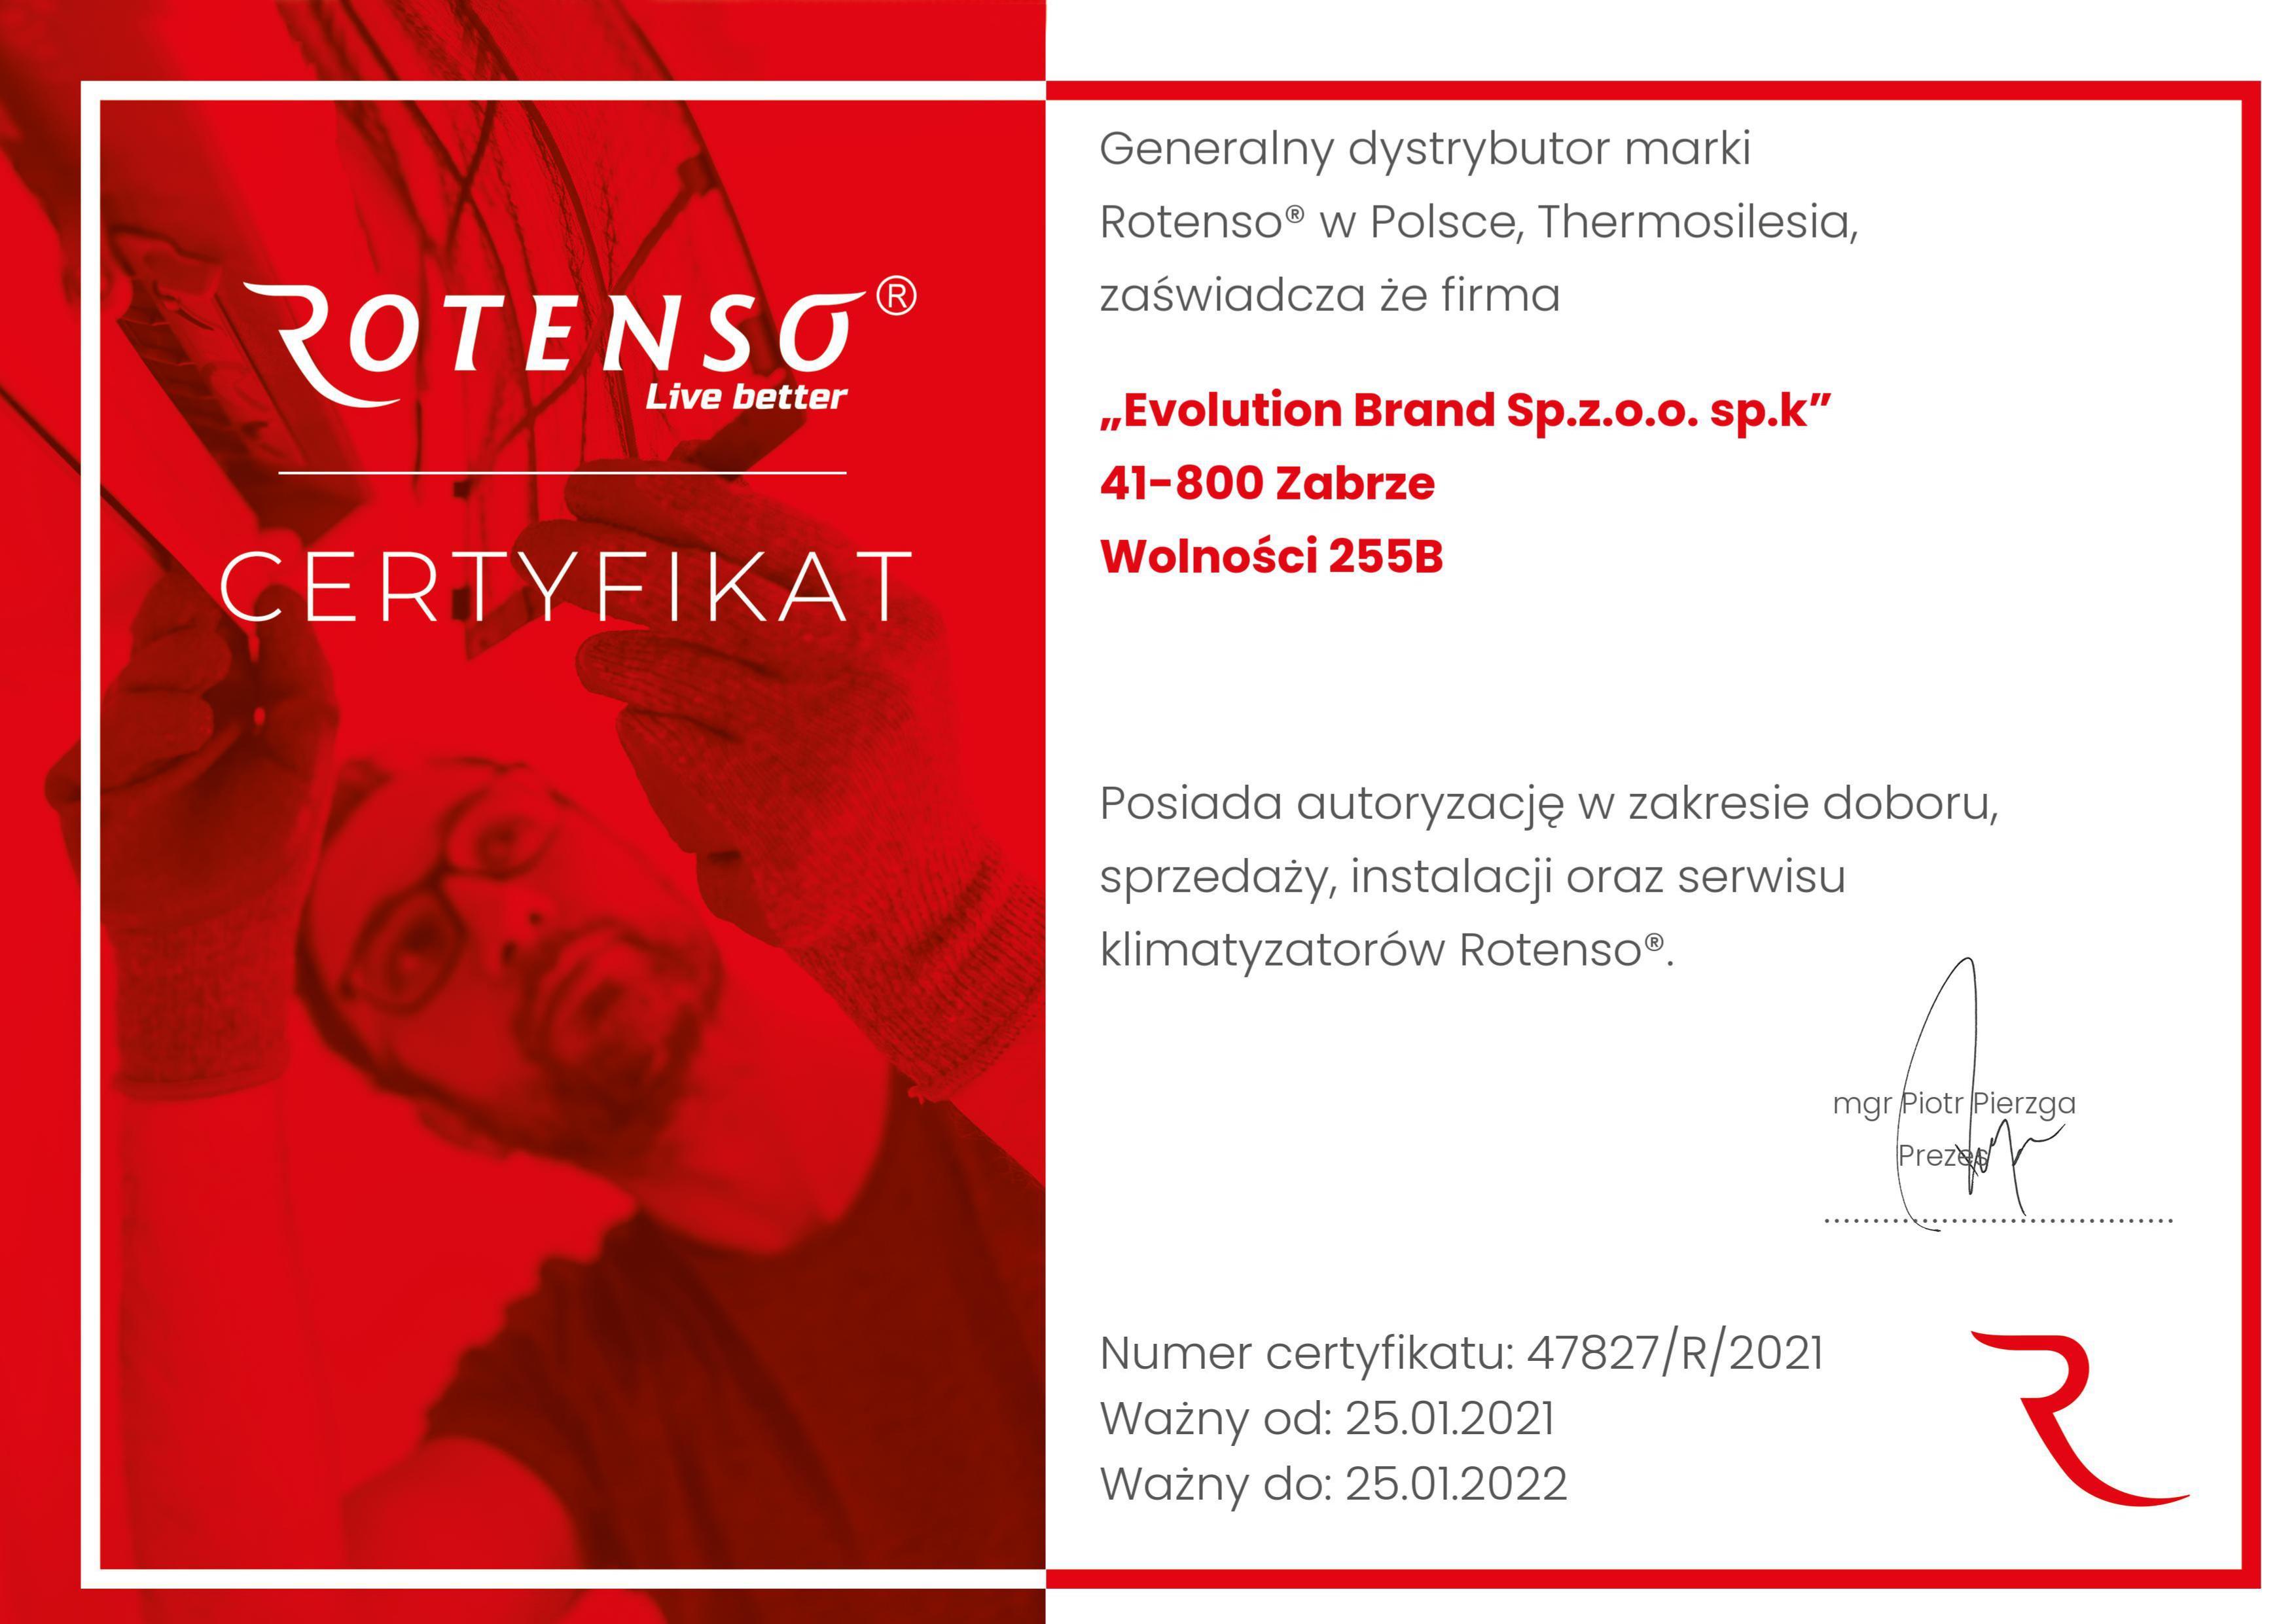 Certyfikat Rotenso 2021